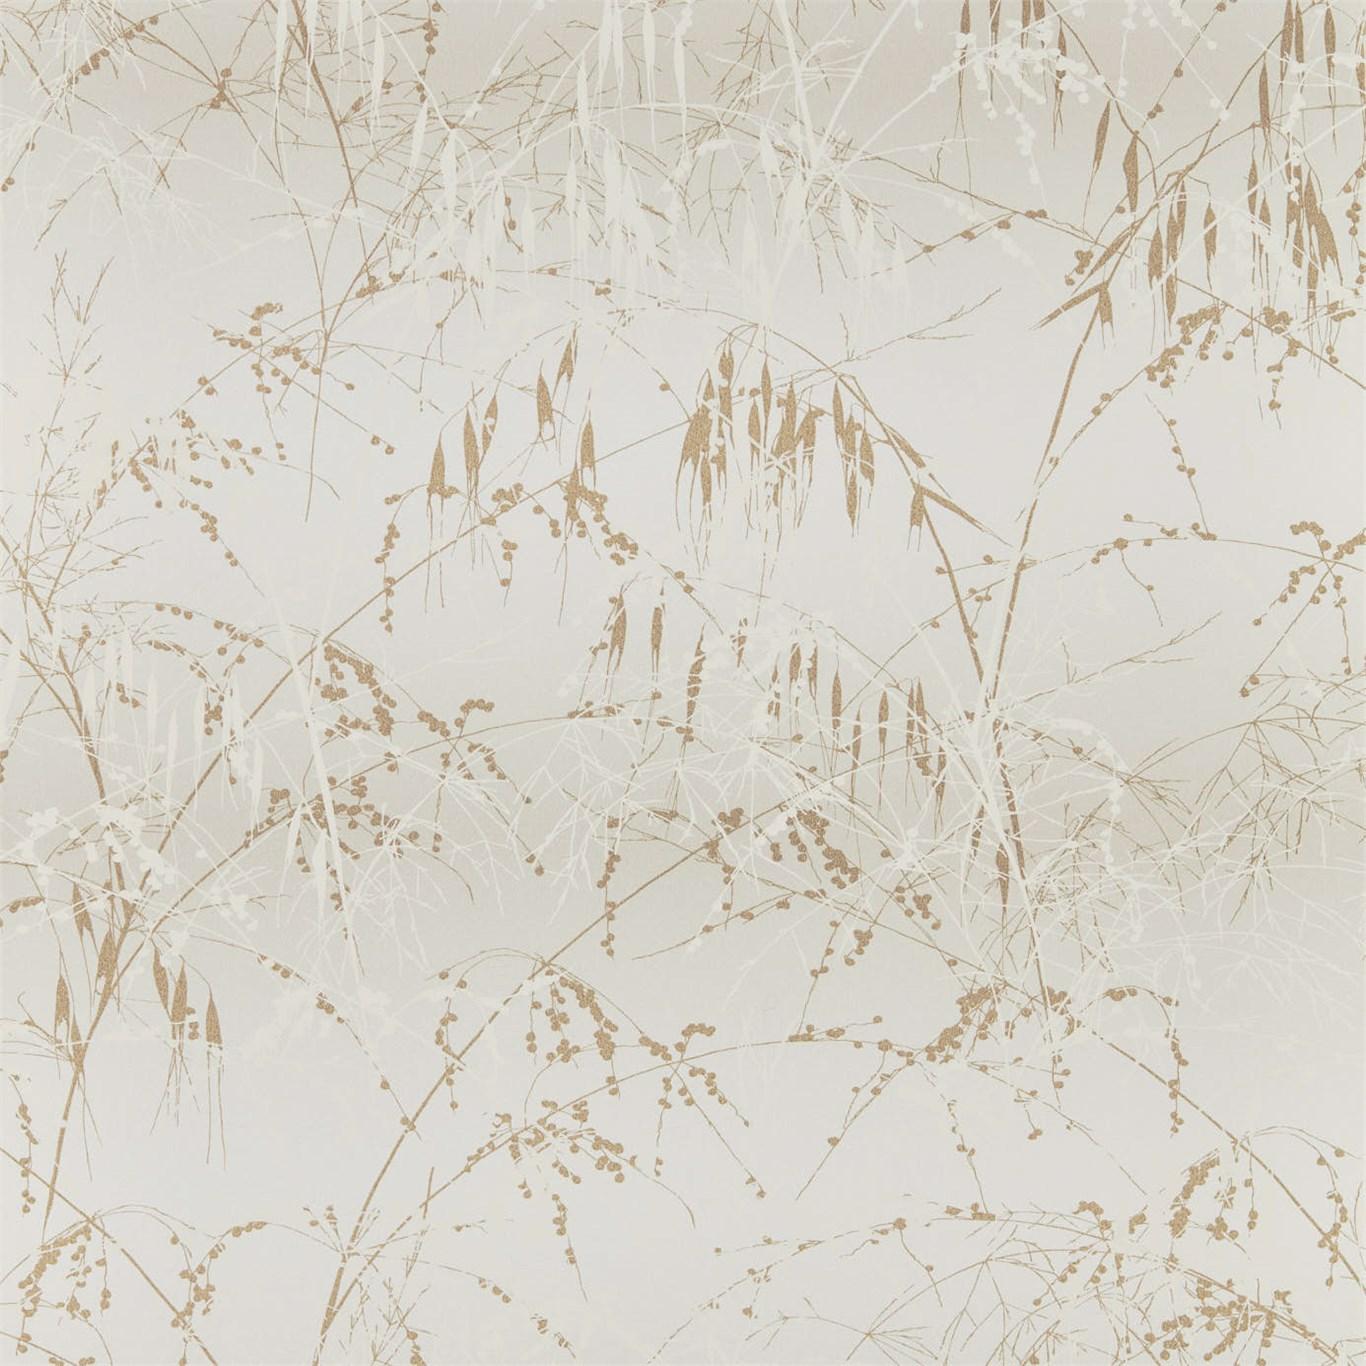 Meadow Grass by HAR